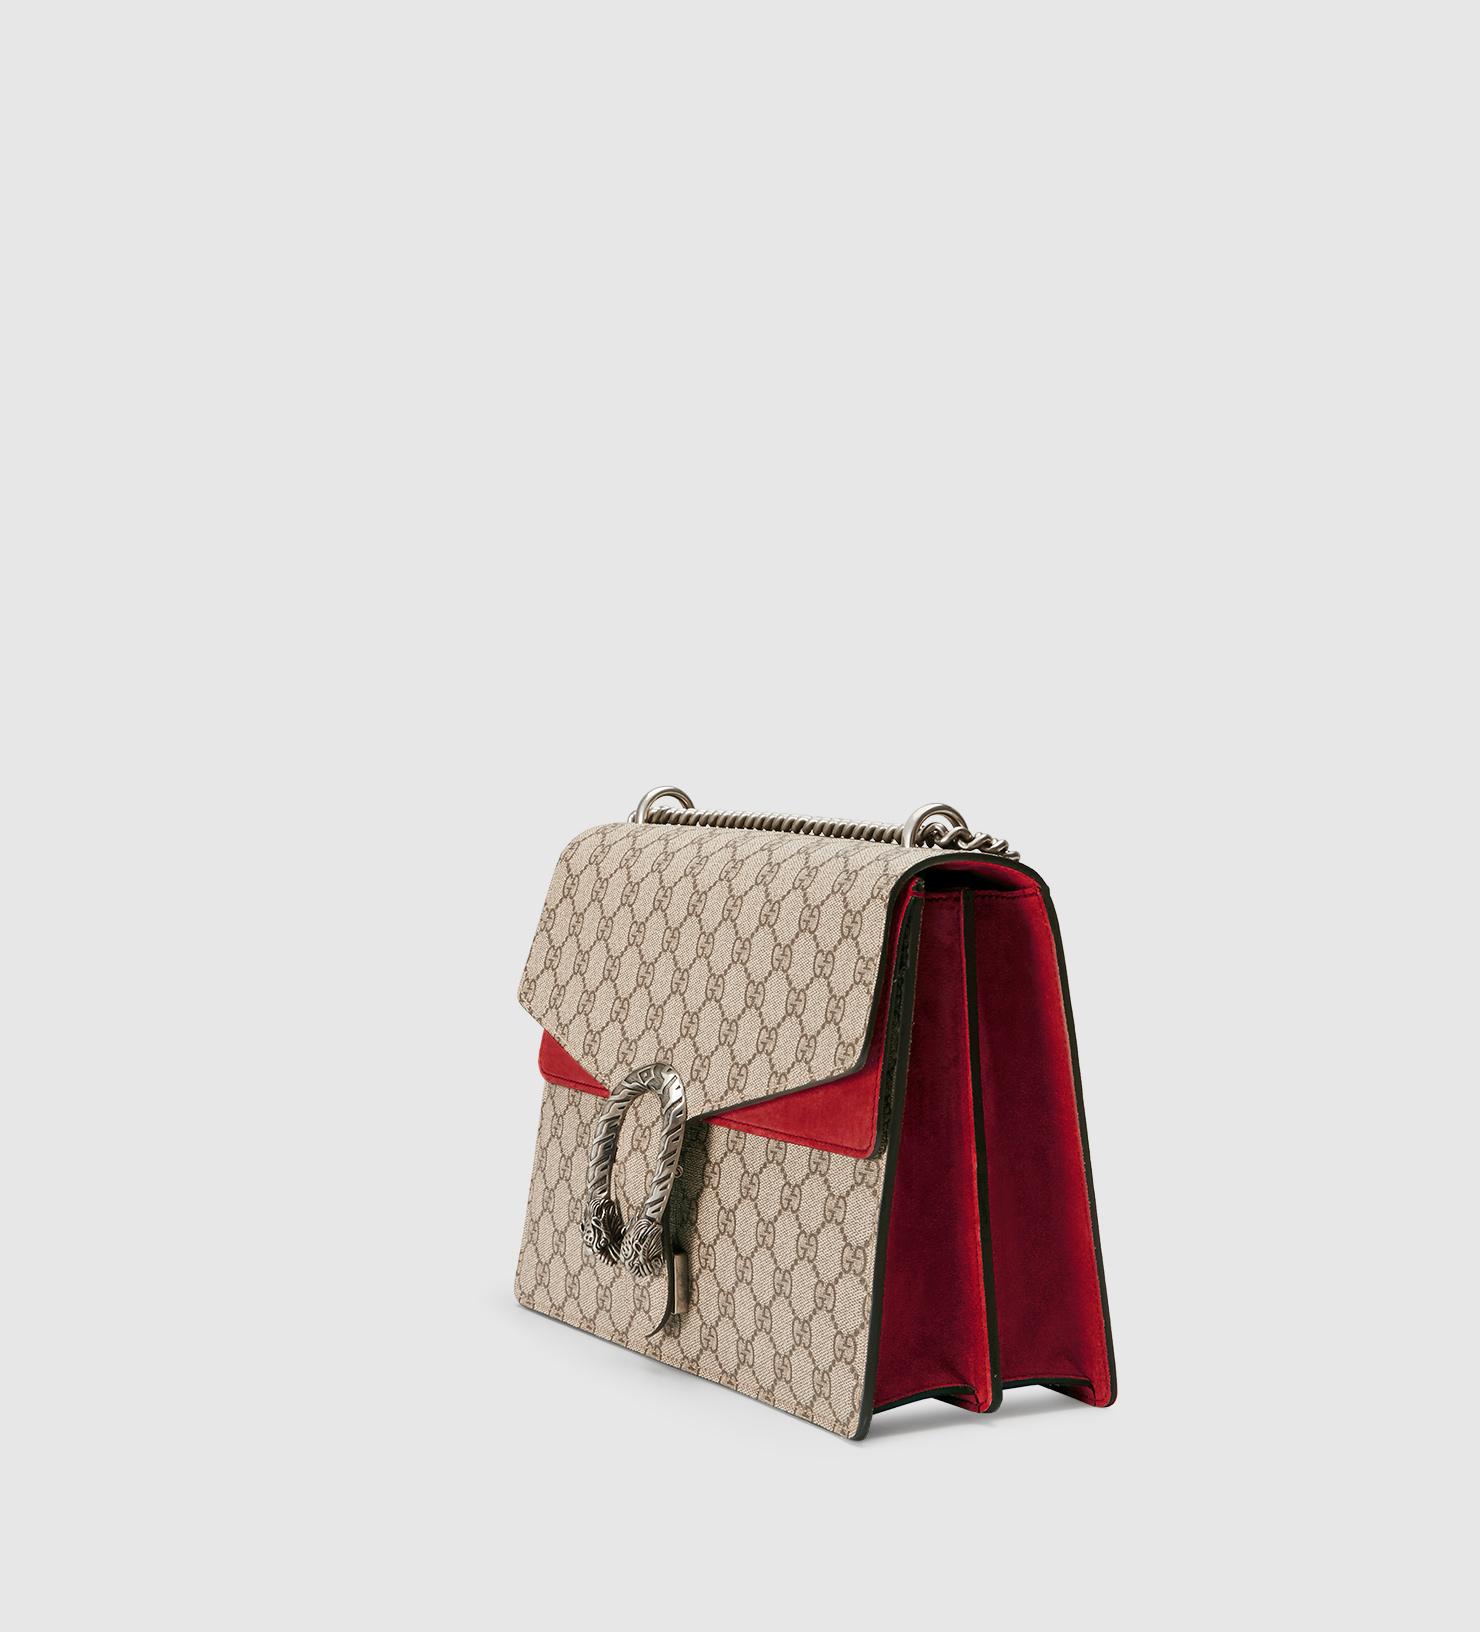 21c932a1cafe Gucci Dionysus GG Supreme Canvas Shoulder Bag in Natural - Lyst